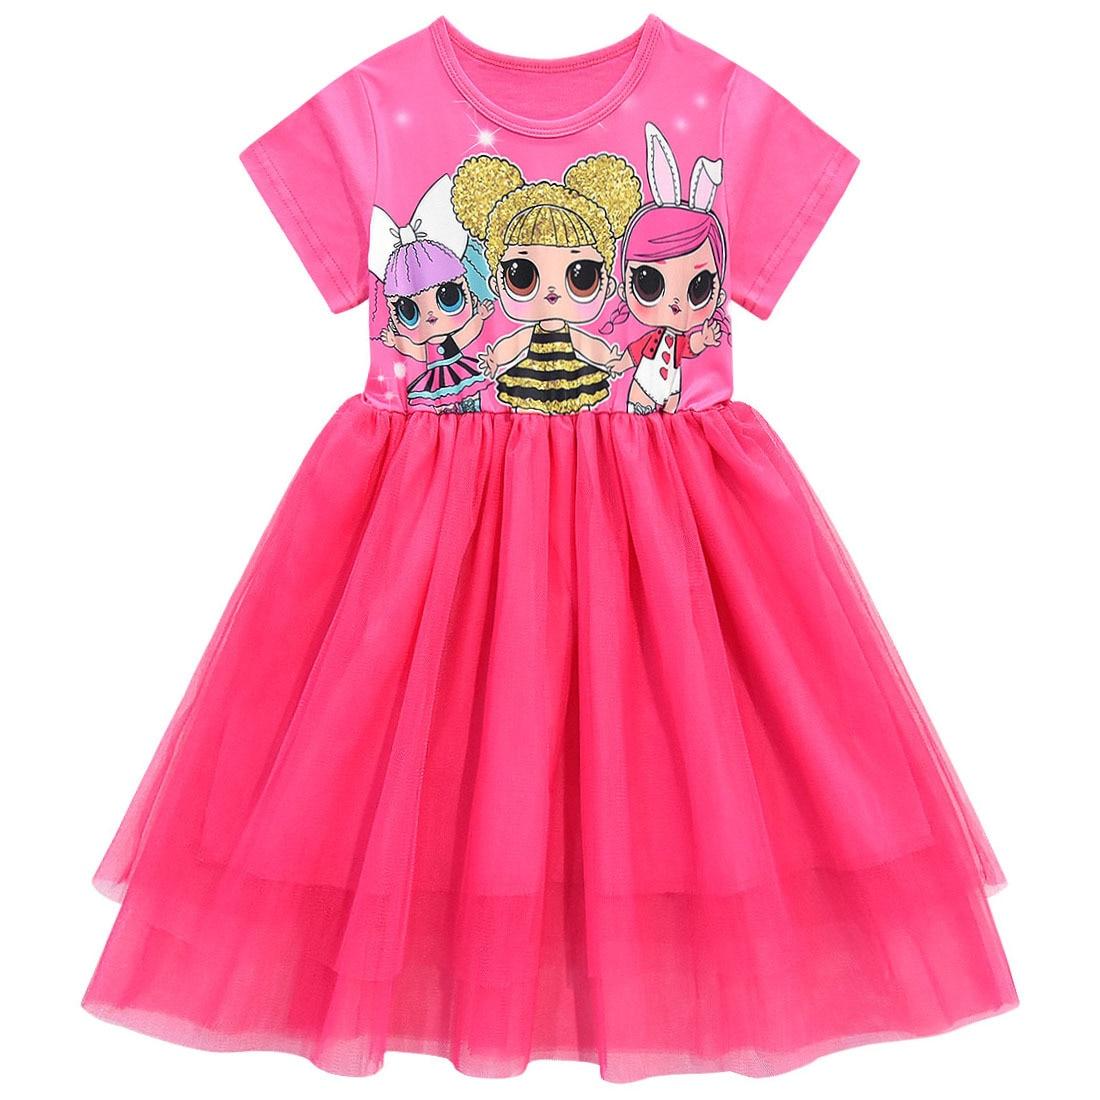 Girls Lol Dress Toddler Baby Lol Doll Clothes Kids Cartoon Print Princess Dress Children Short Sleeve Birthday Vestido for Girl 2